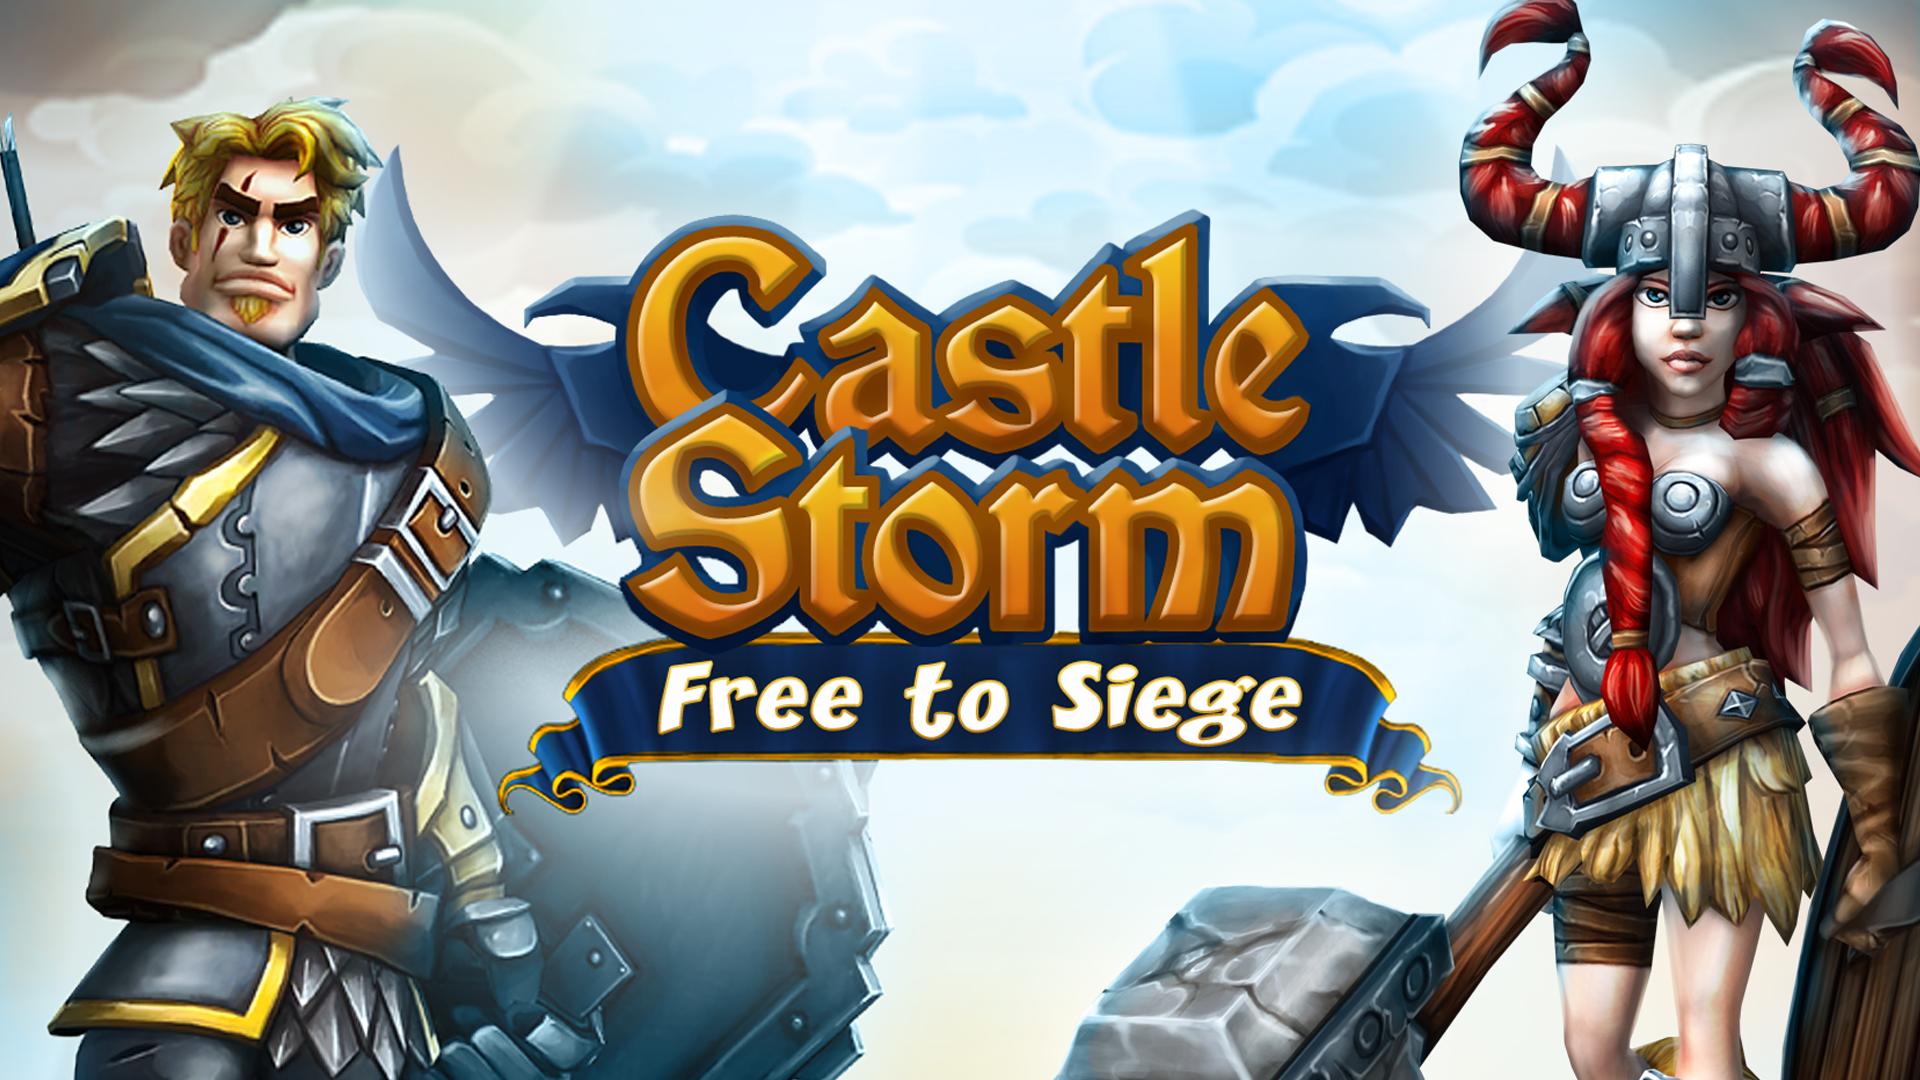 CastleStorm - Free to Siege screenshot #9